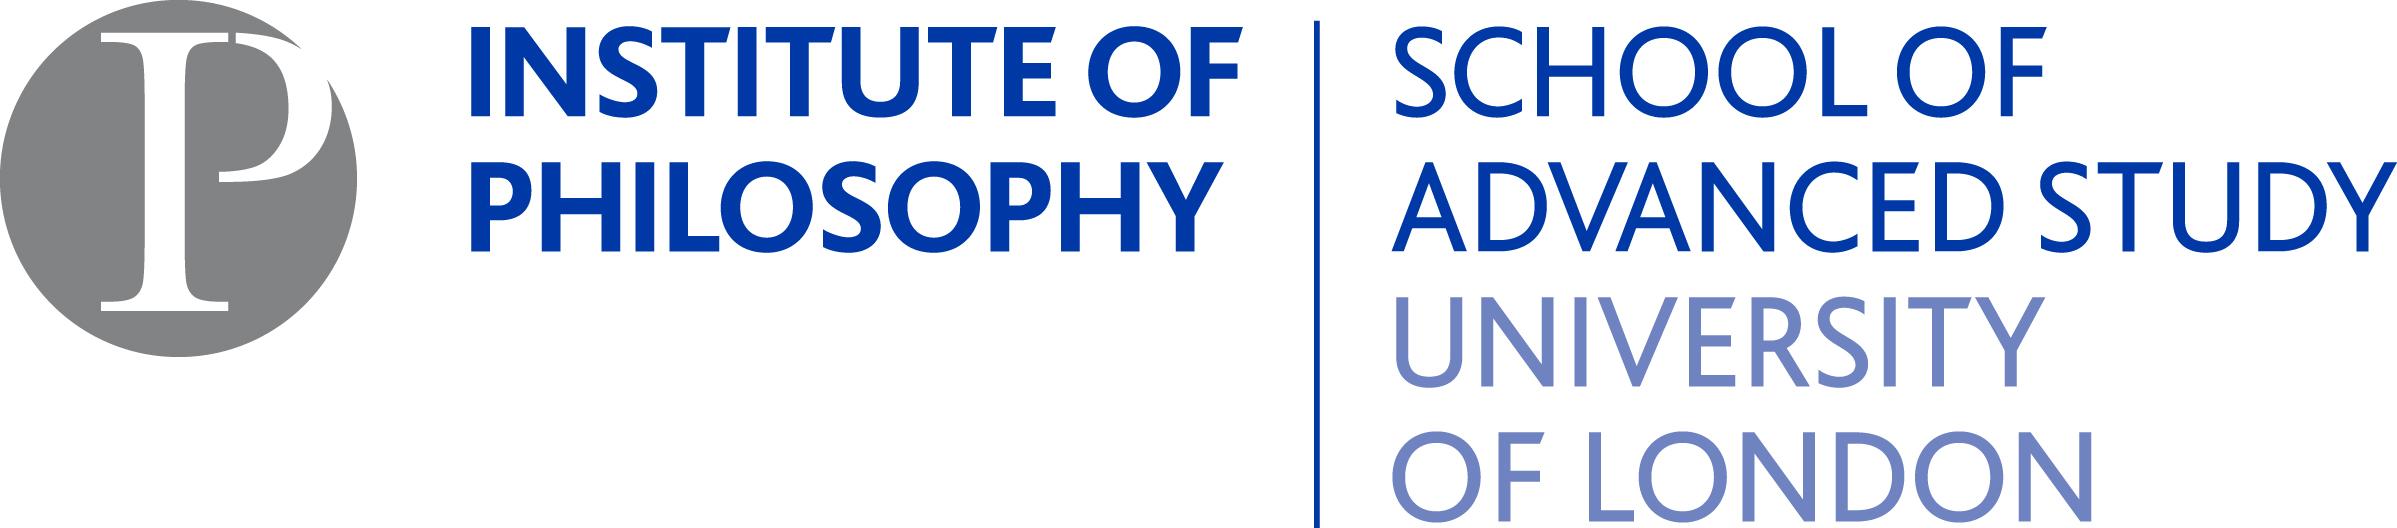 Logo of the Institute of Philosophy, School of Advanced Study, University of London